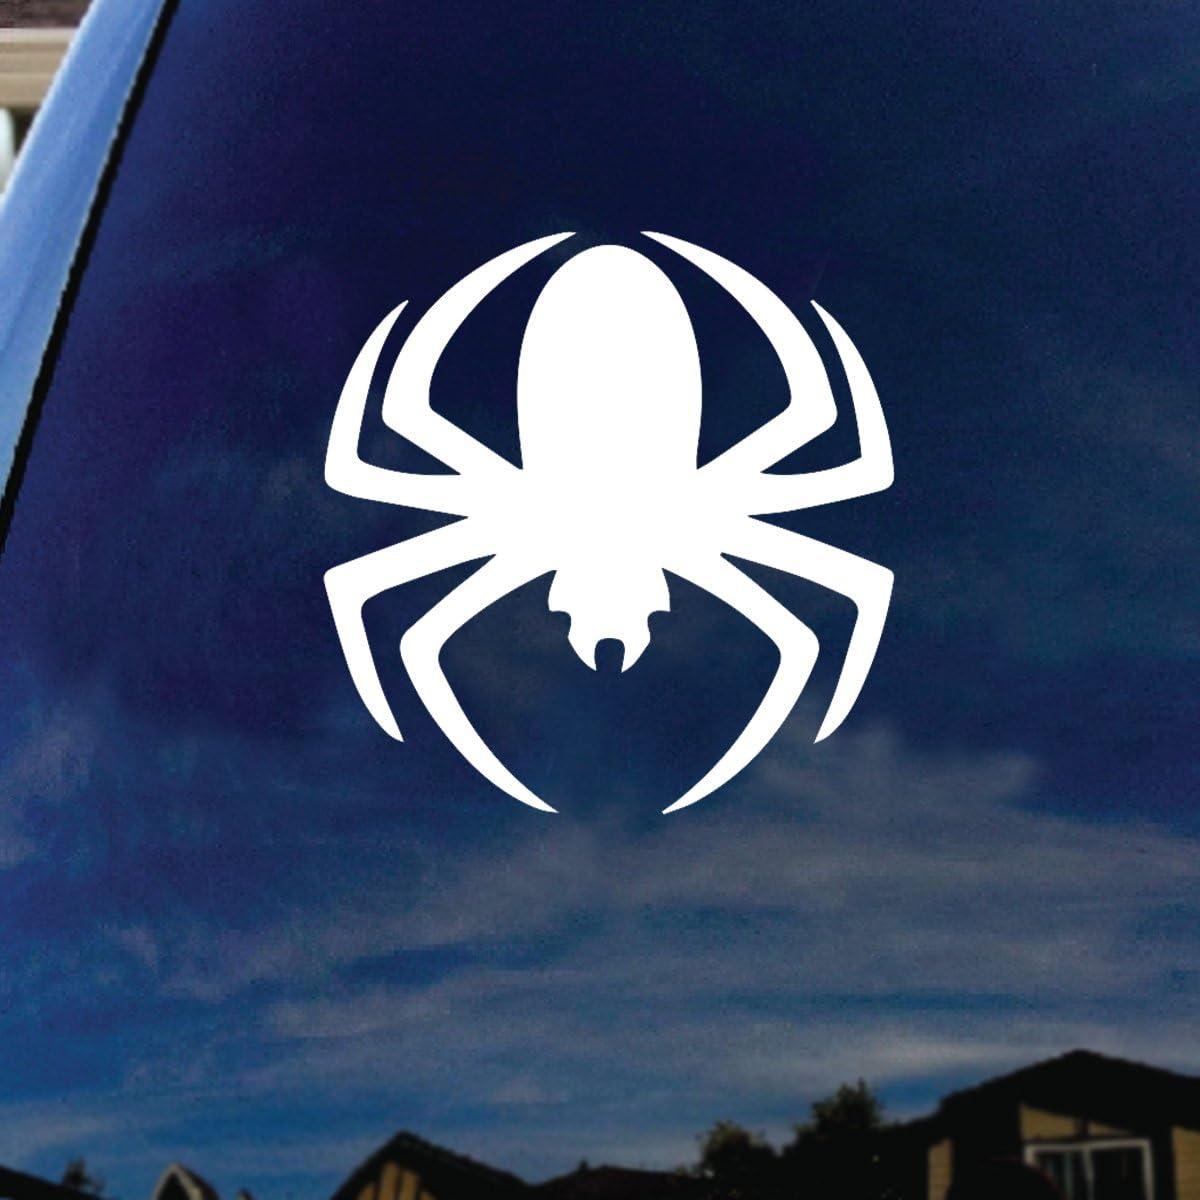 "SoCoolDesign Year Of The Spider Car Truck Laptop Sticker Decal 4"" Diameter"